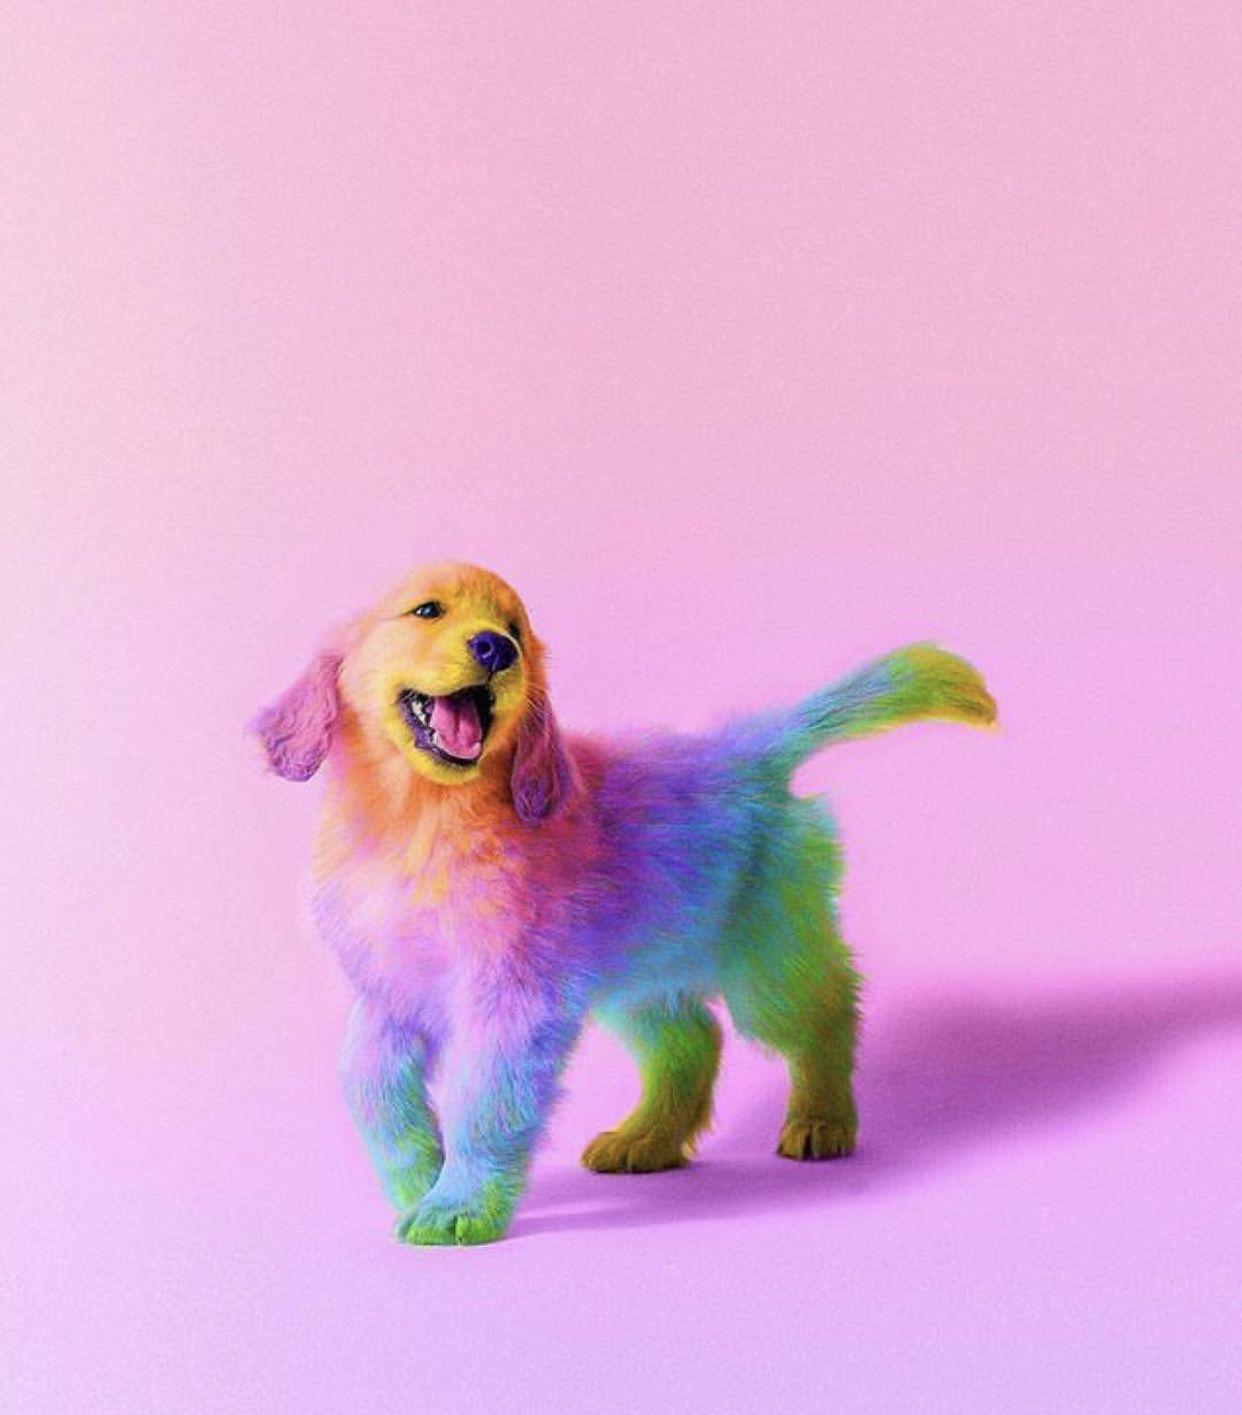 Cute Puppy Cute Animals Rainbow Dog Colorful Animals